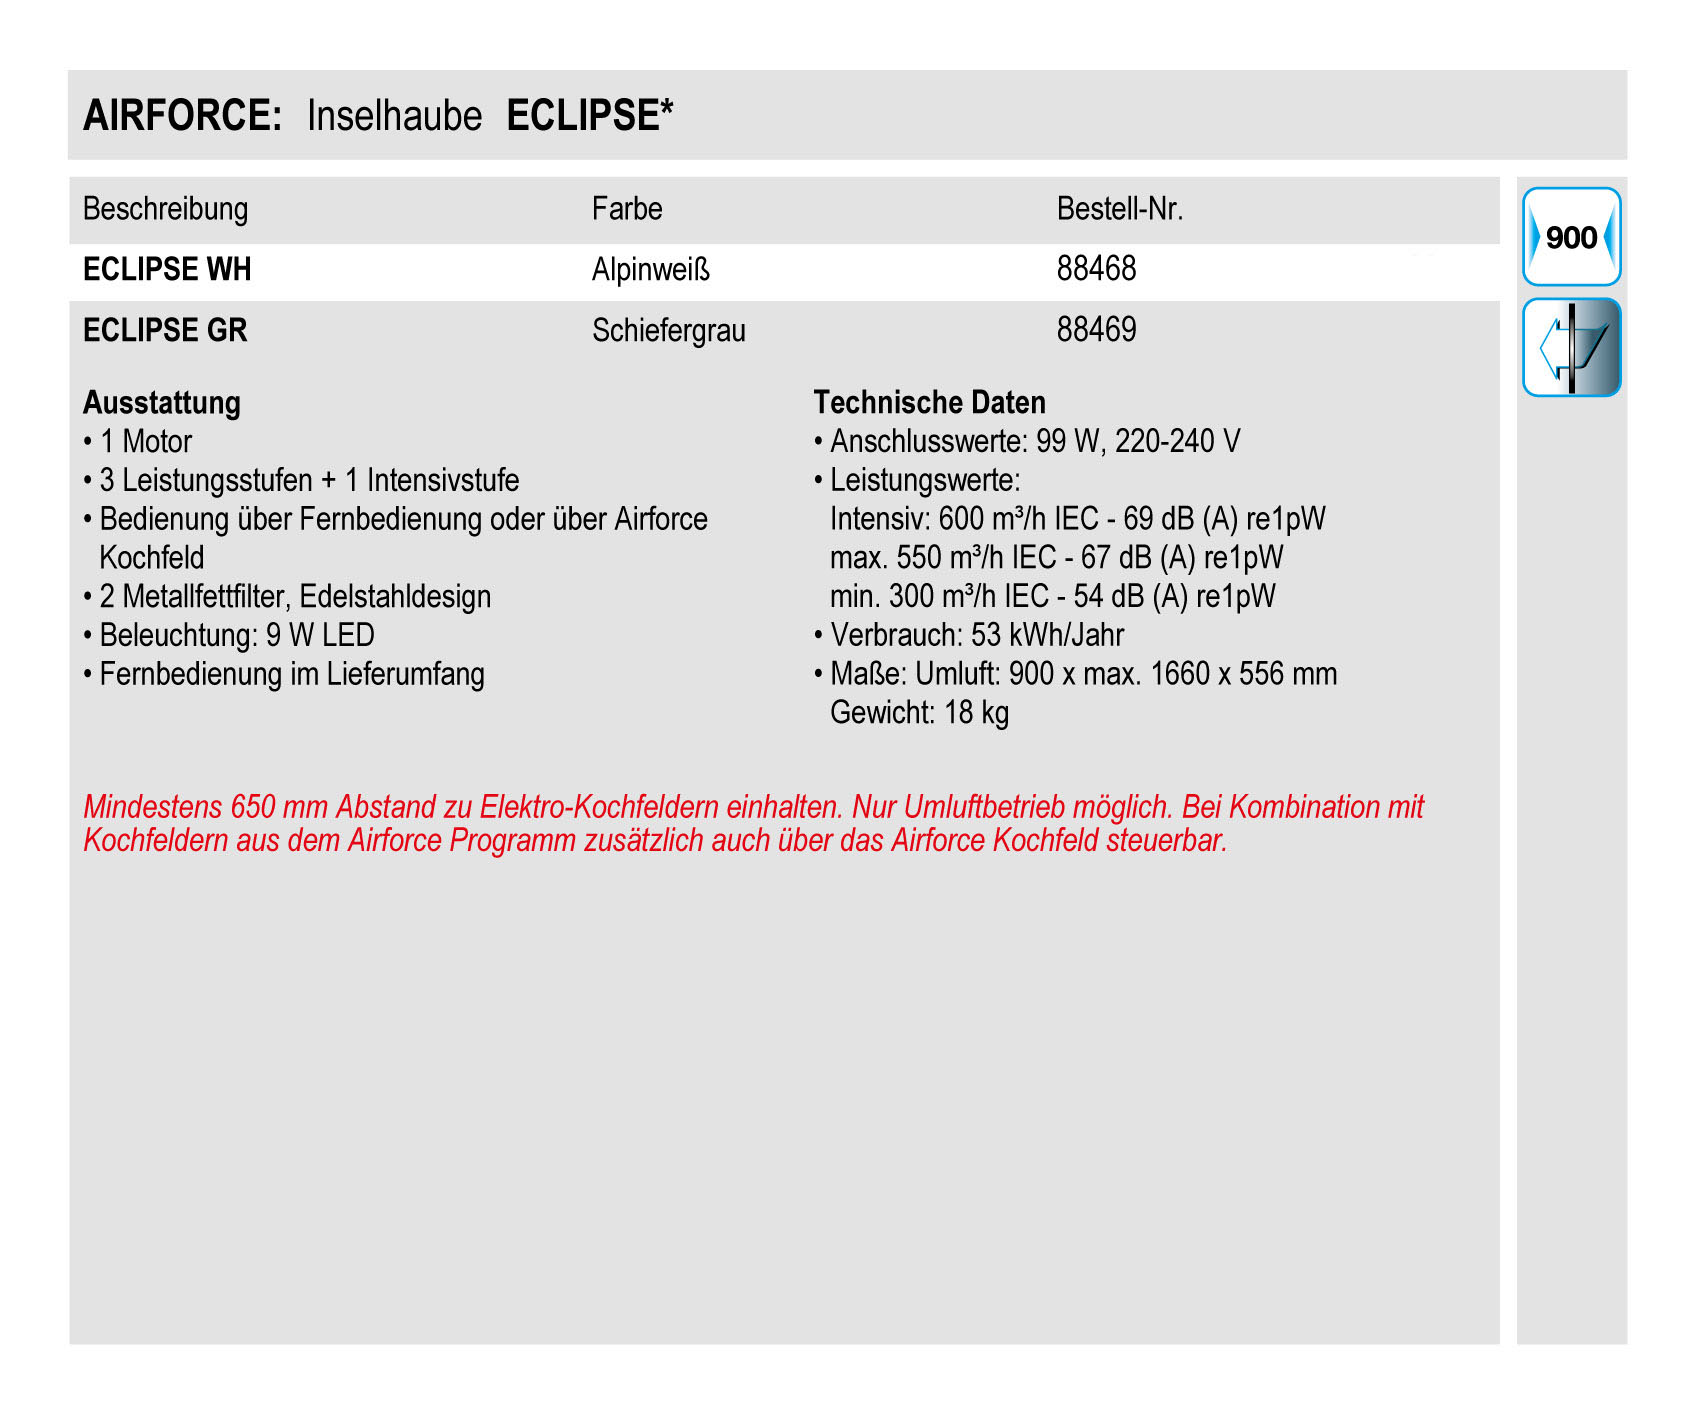 airforce eclipse bianco dunstabzugshaube inselhaube ebay. Black Bedroom Furniture Sets. Home Design Ideas